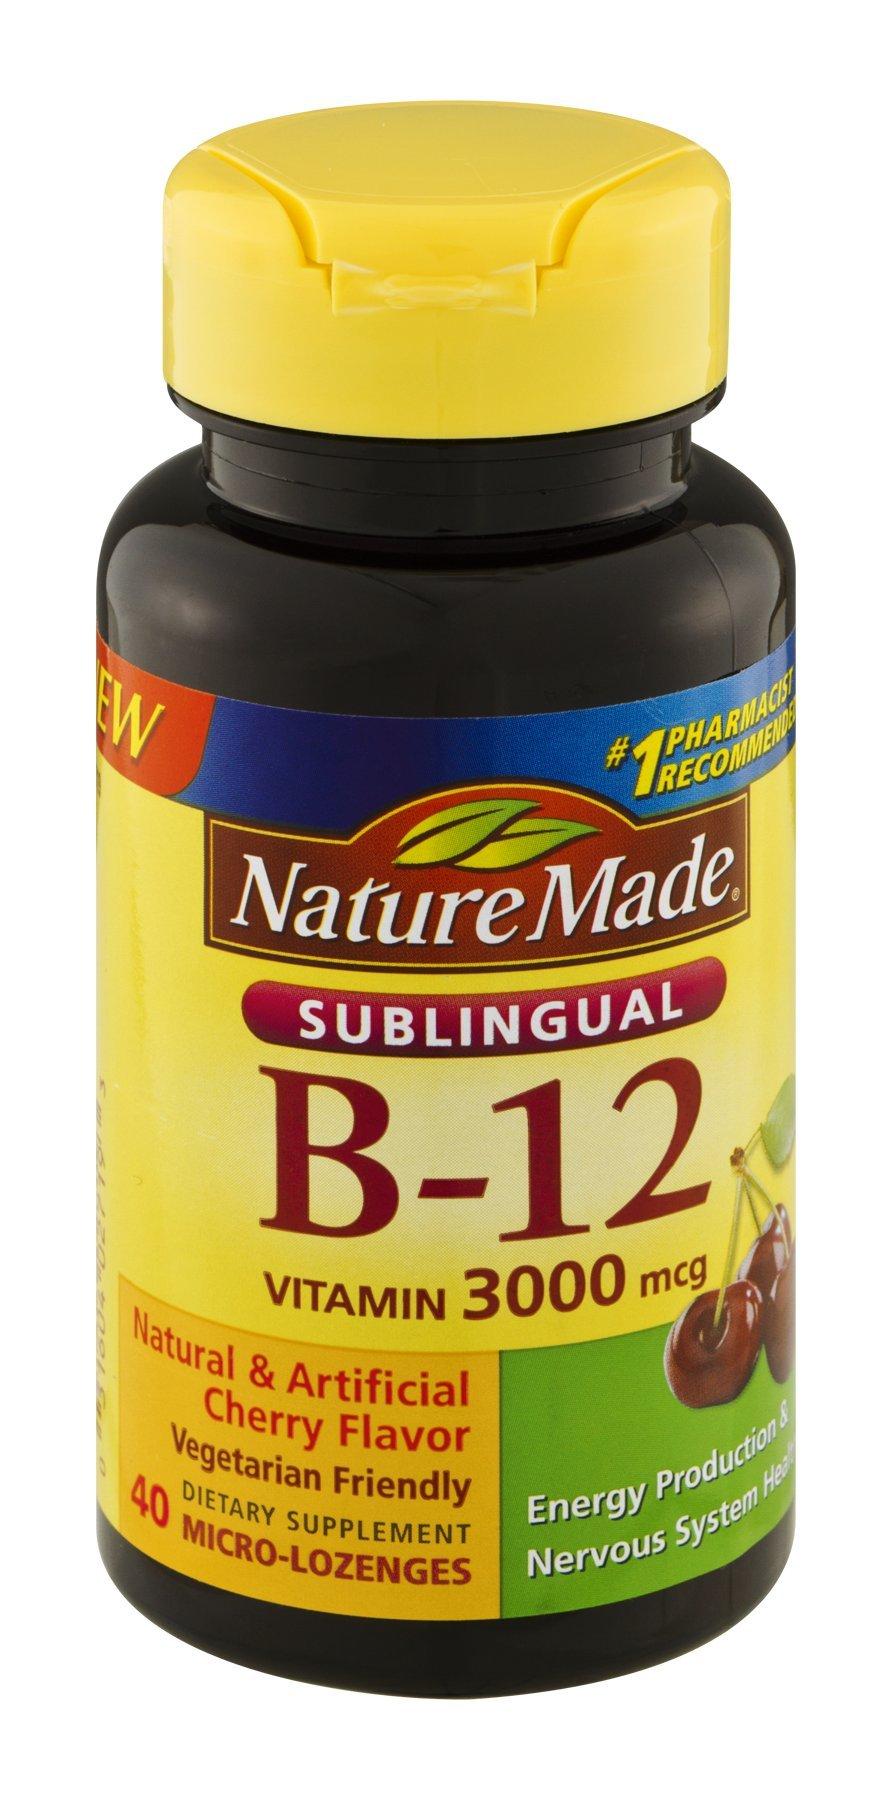 Nature Made Vitamin B-12 3000mcg Sublingual Tablets - 40 ea, Pack of 3